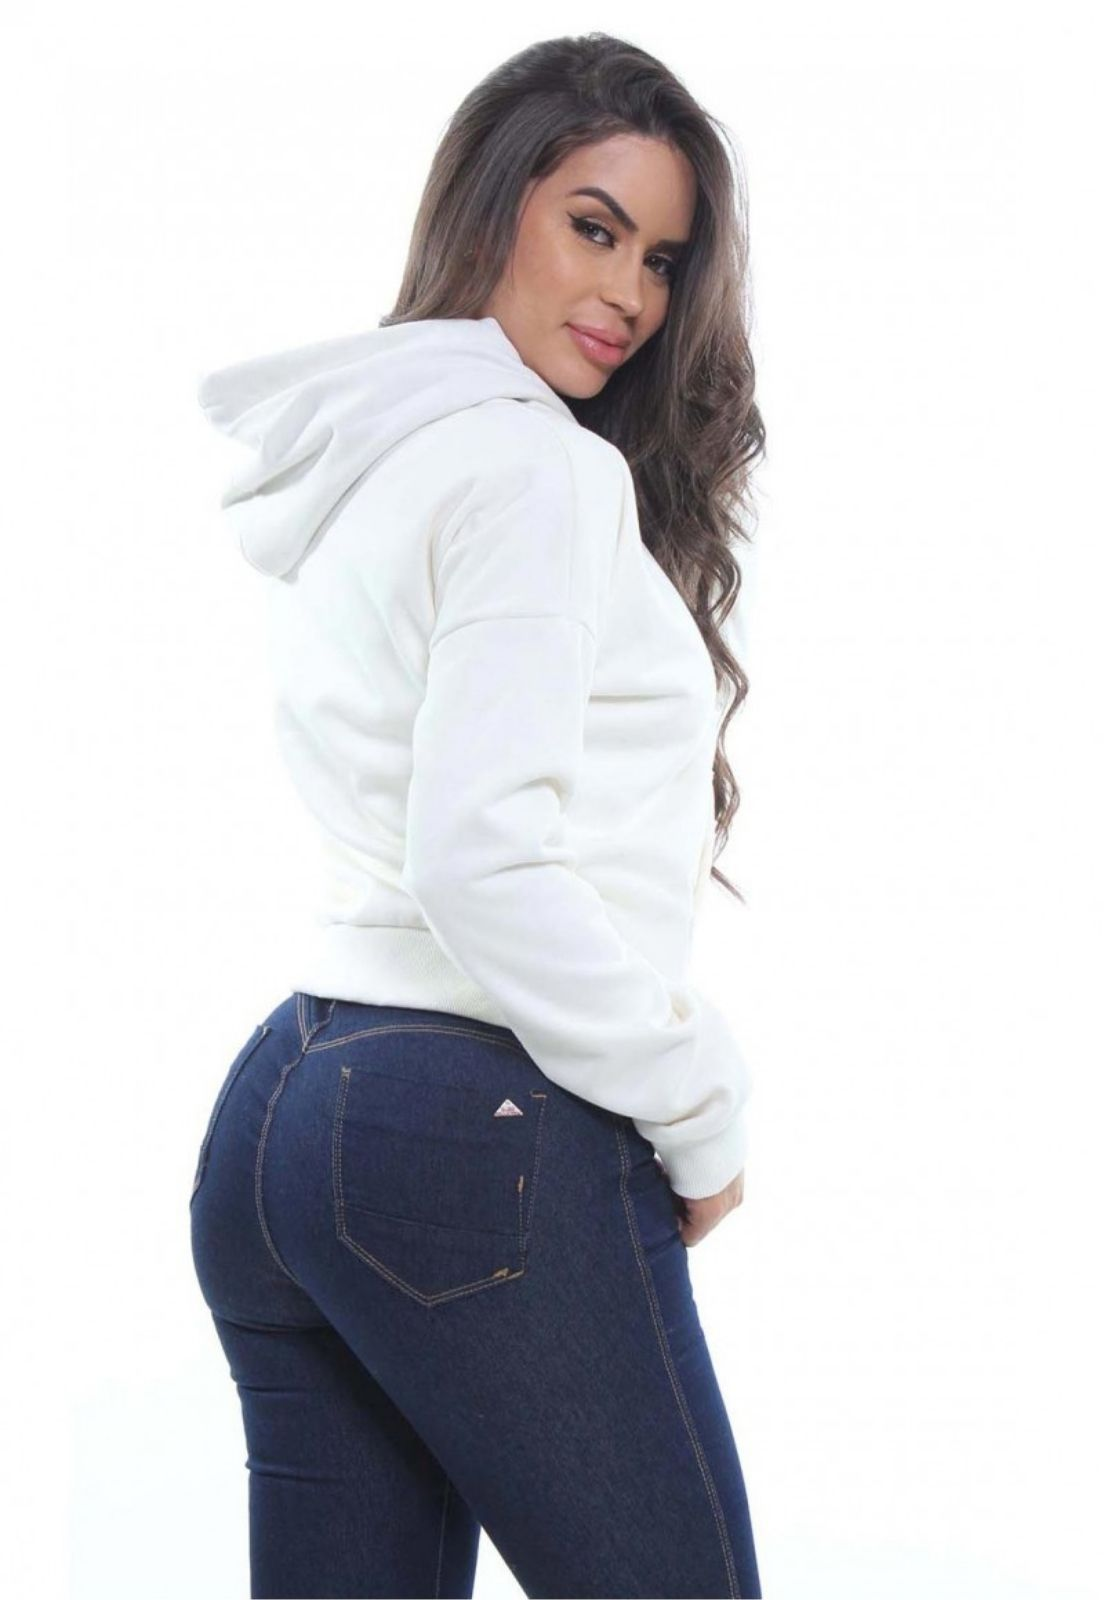 Blusa Moletom Feminina Com Capuz Crocker - 47958  - CROCKER JEANS